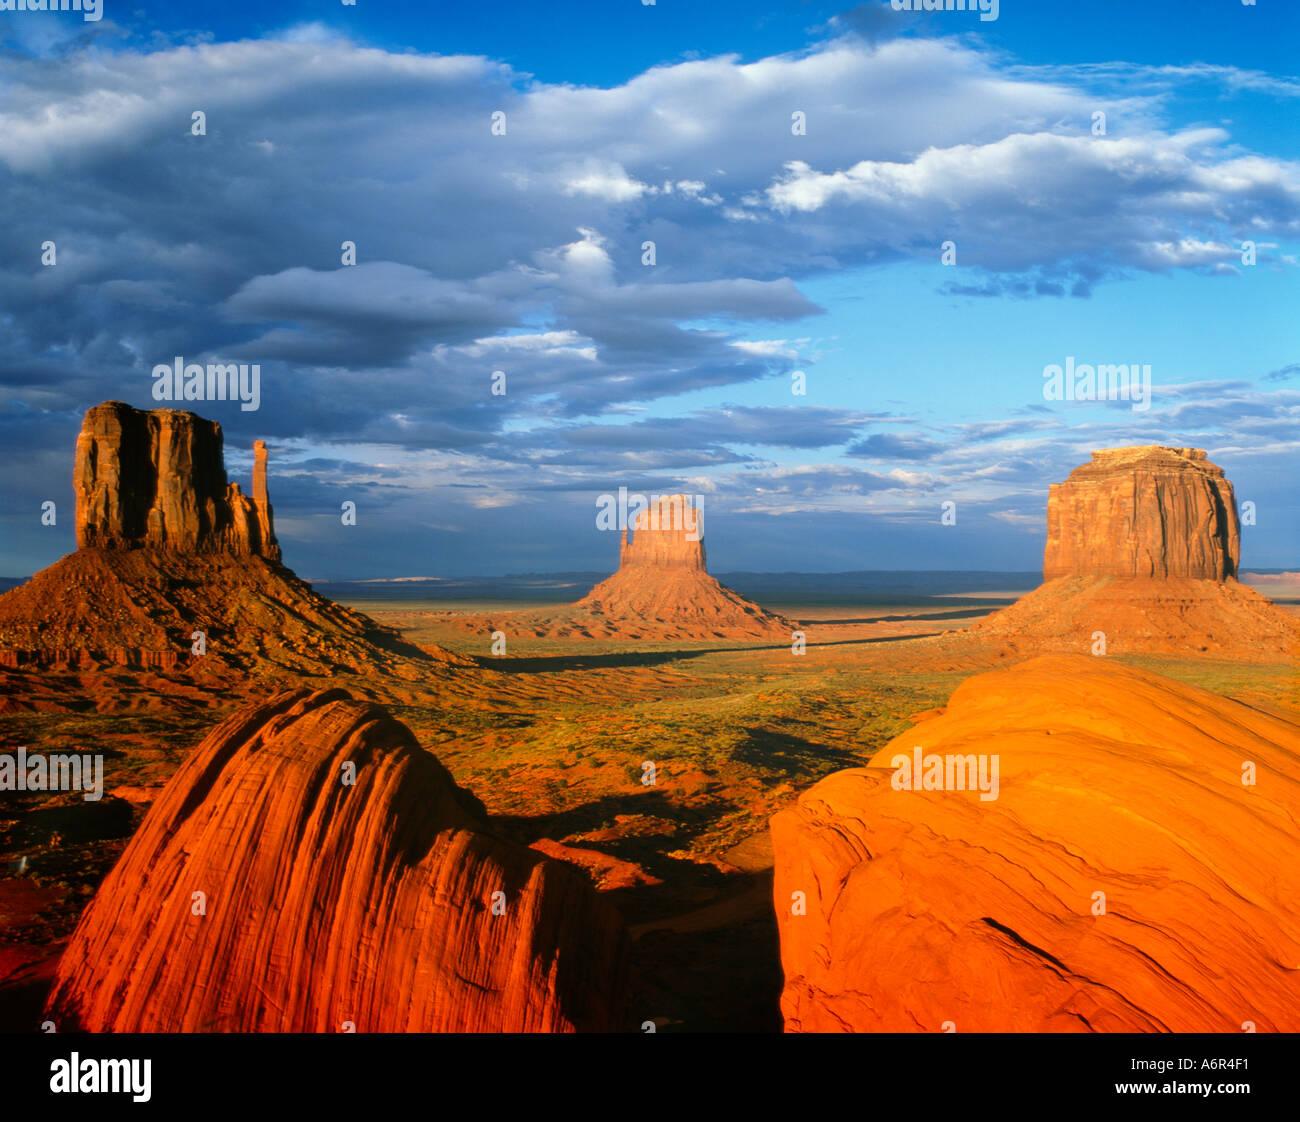 Mitten Buttes Monument Valley Arizona USA Photo Stock